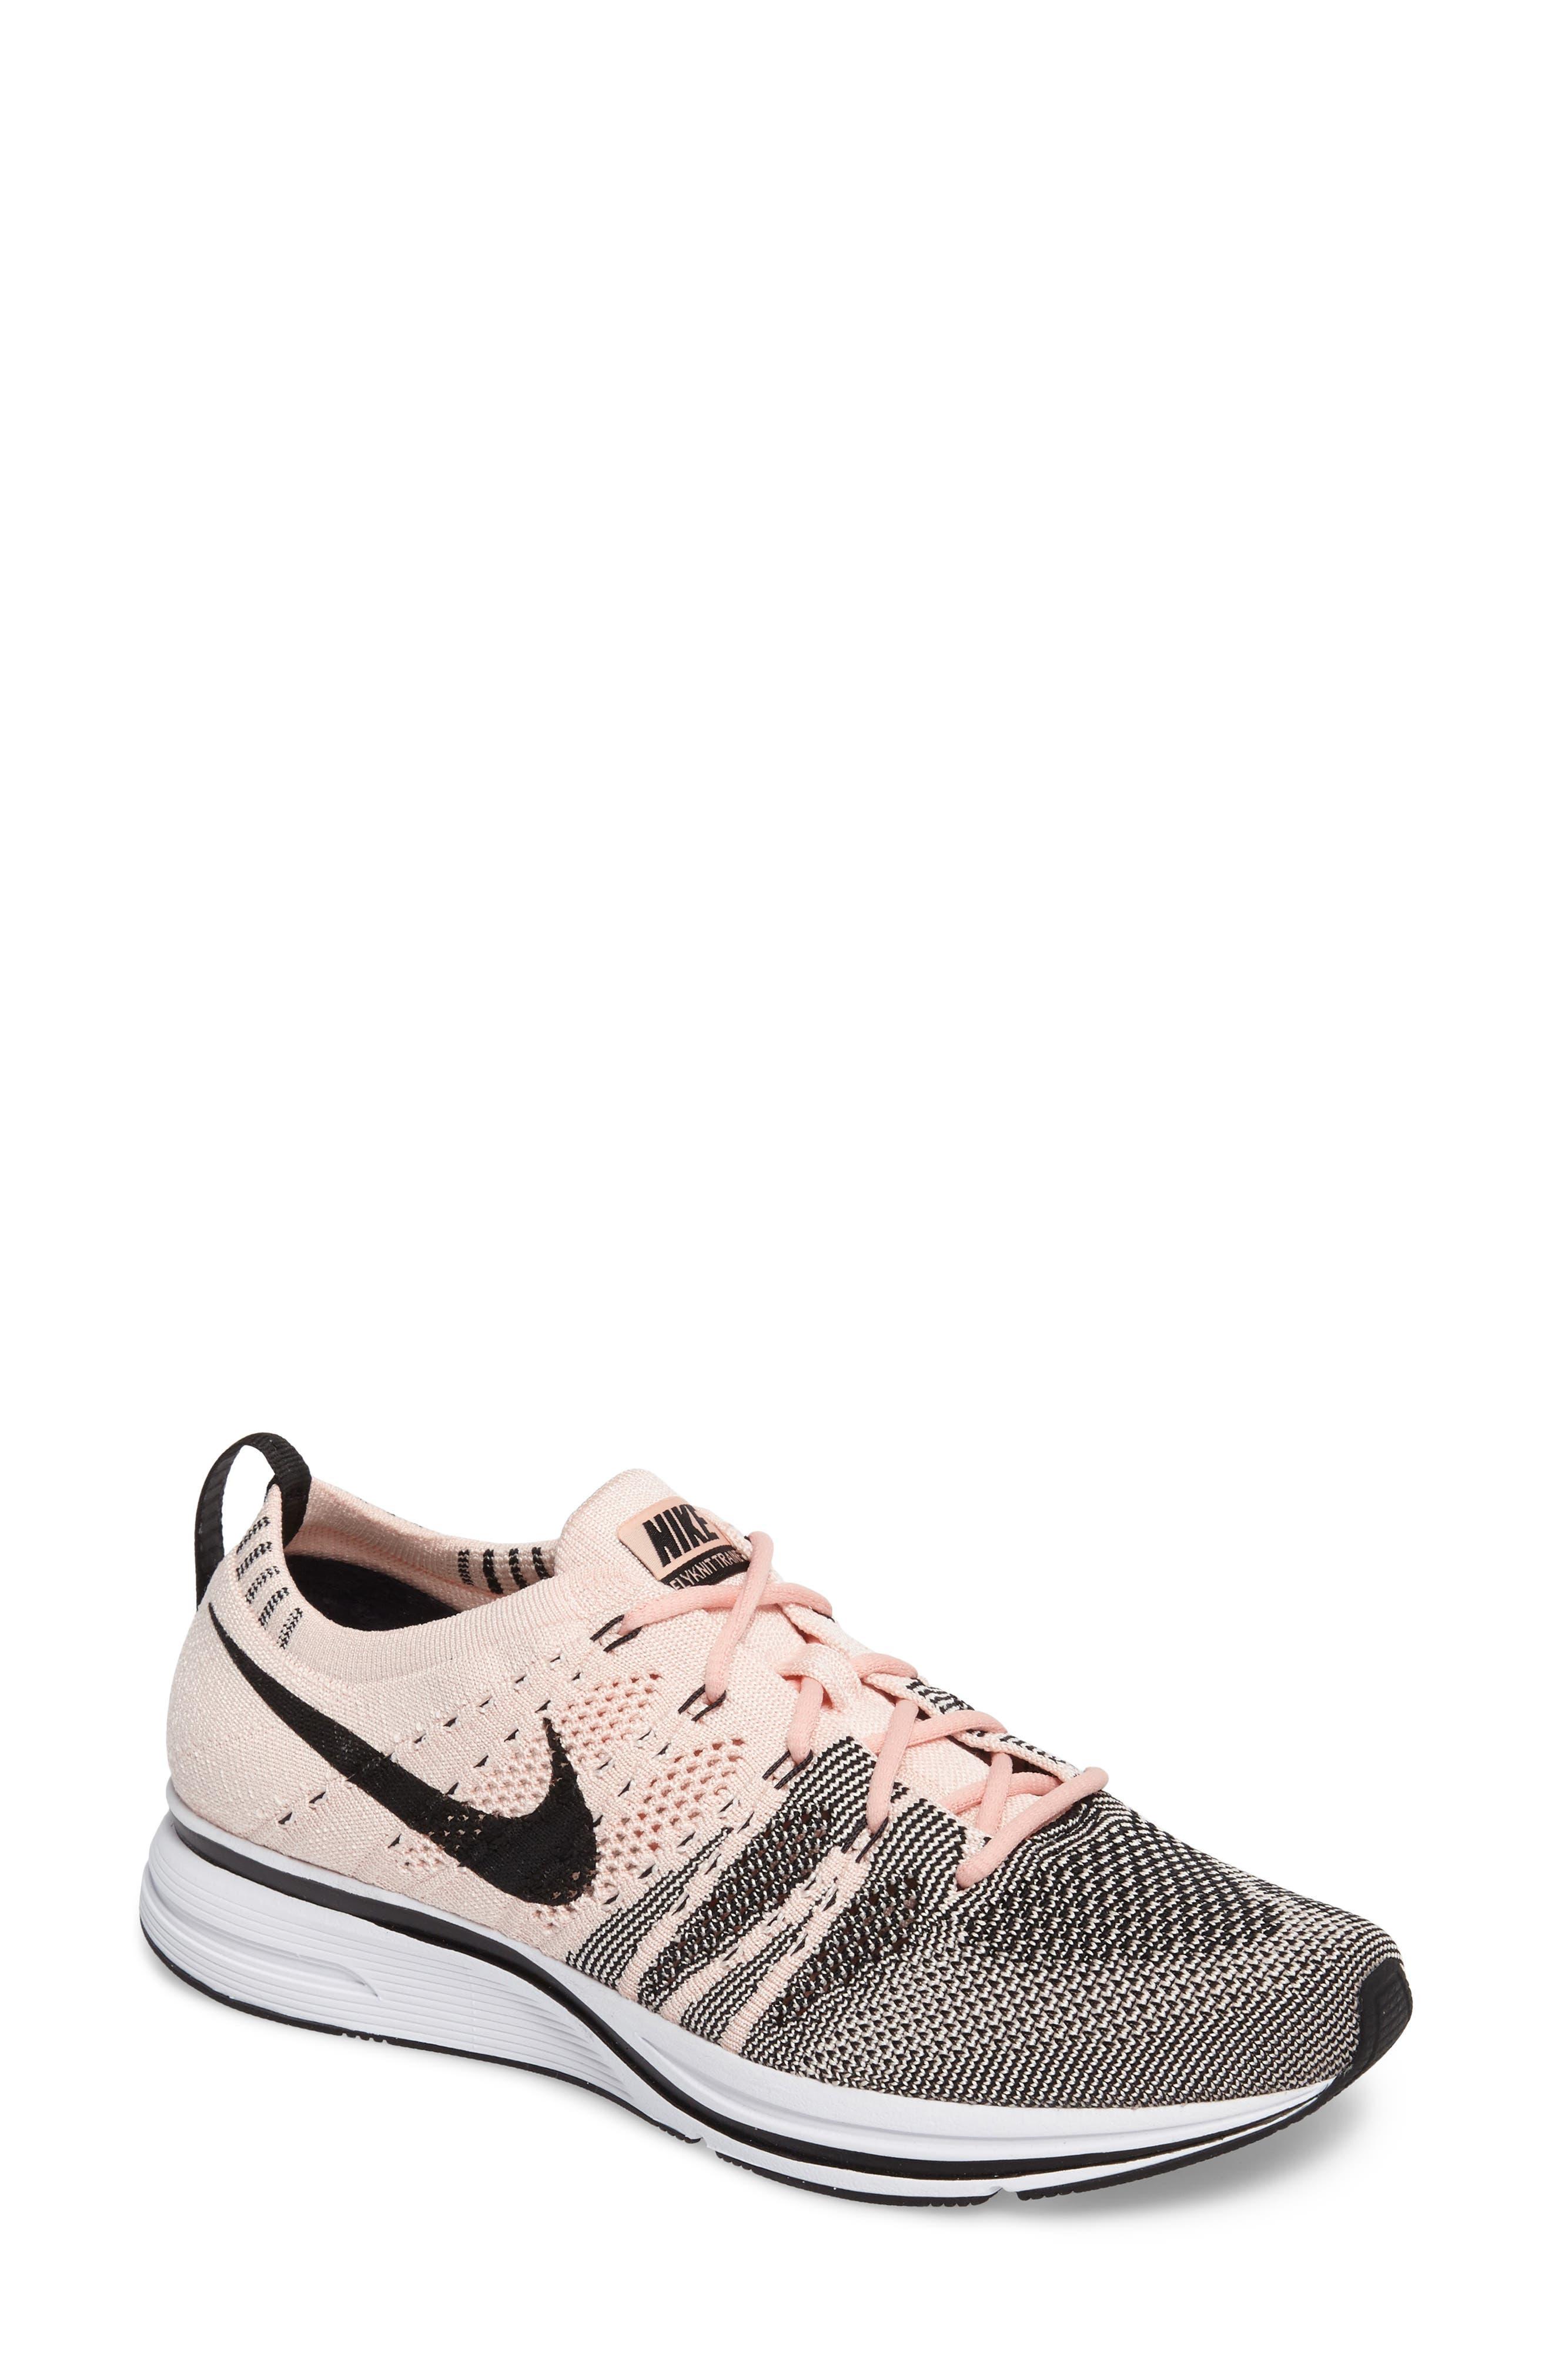 NikeLab Flyknit Trainer Sneaker,                             Main thumbnail 1, color,                             Sunset Tint/Black-White